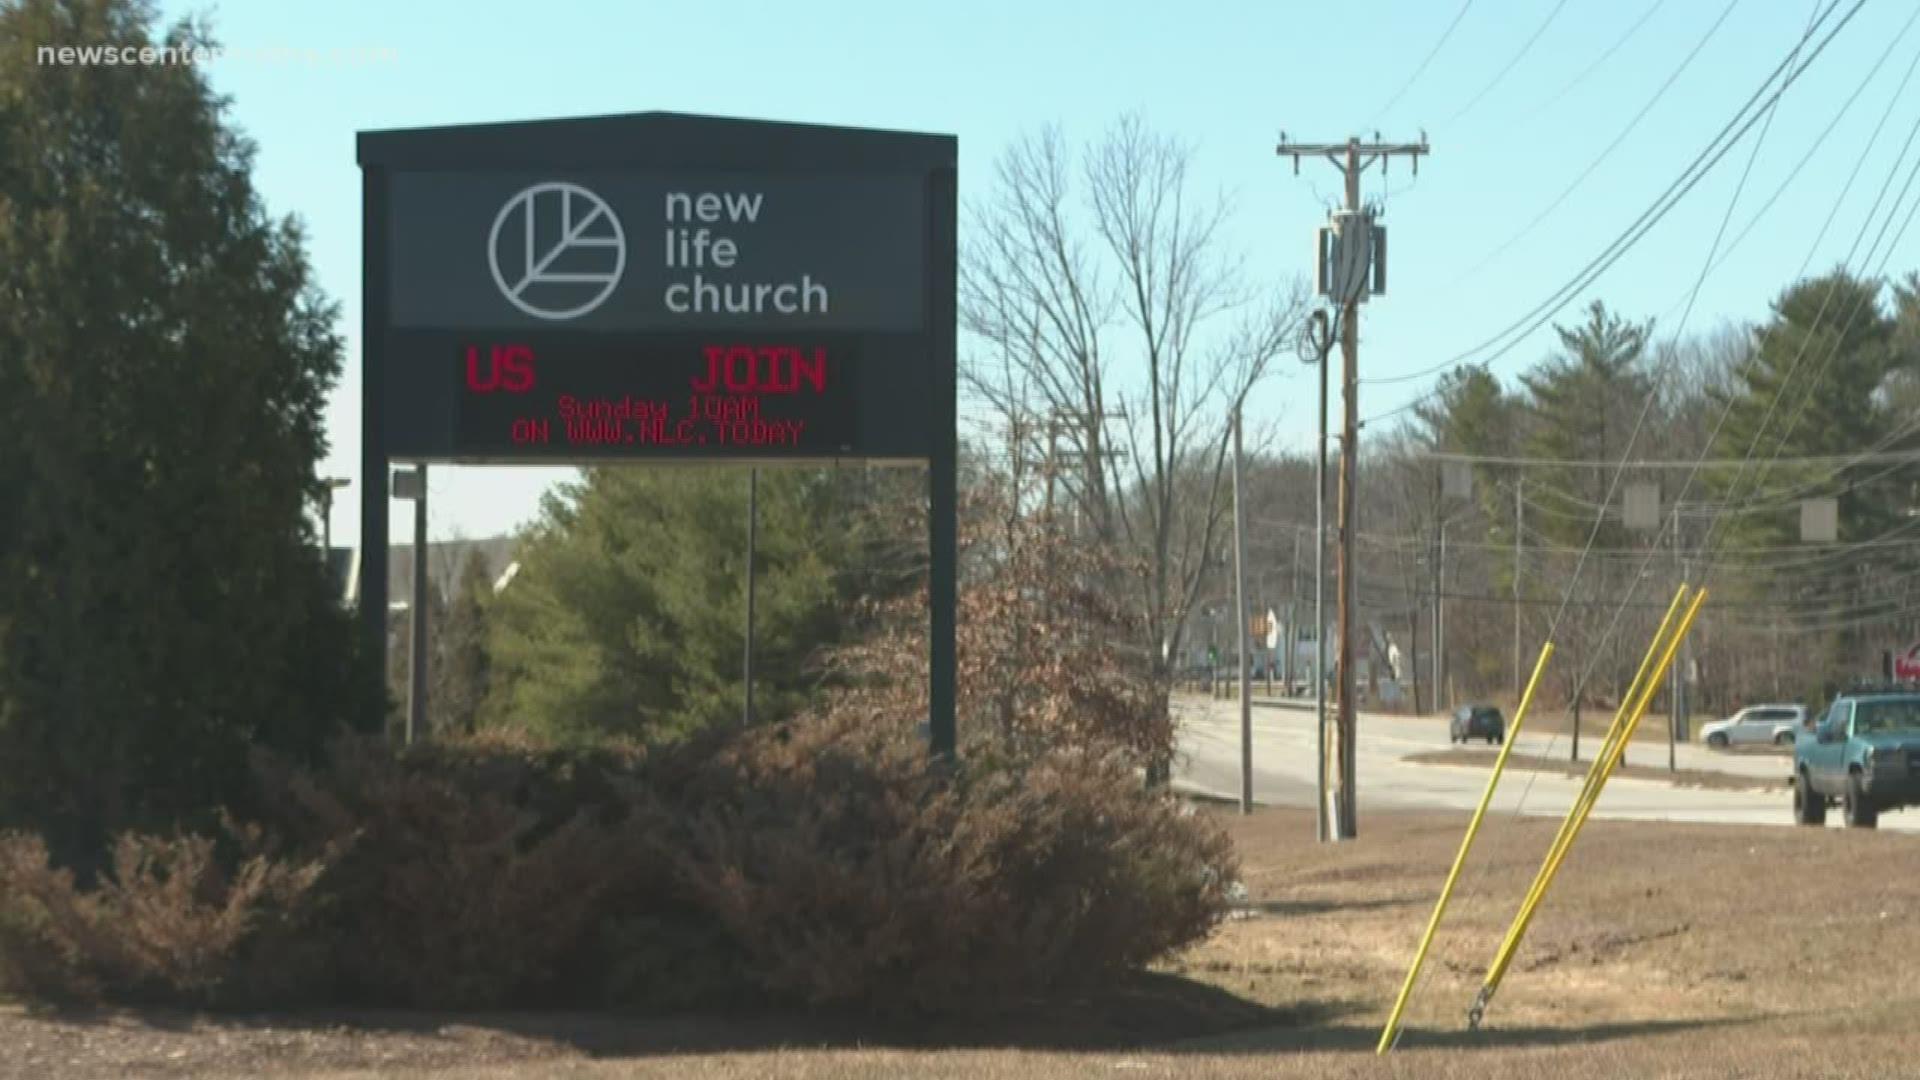 Maine Church Serves Community During Coronavirus Covid 19 Scare Newscentermaine Com